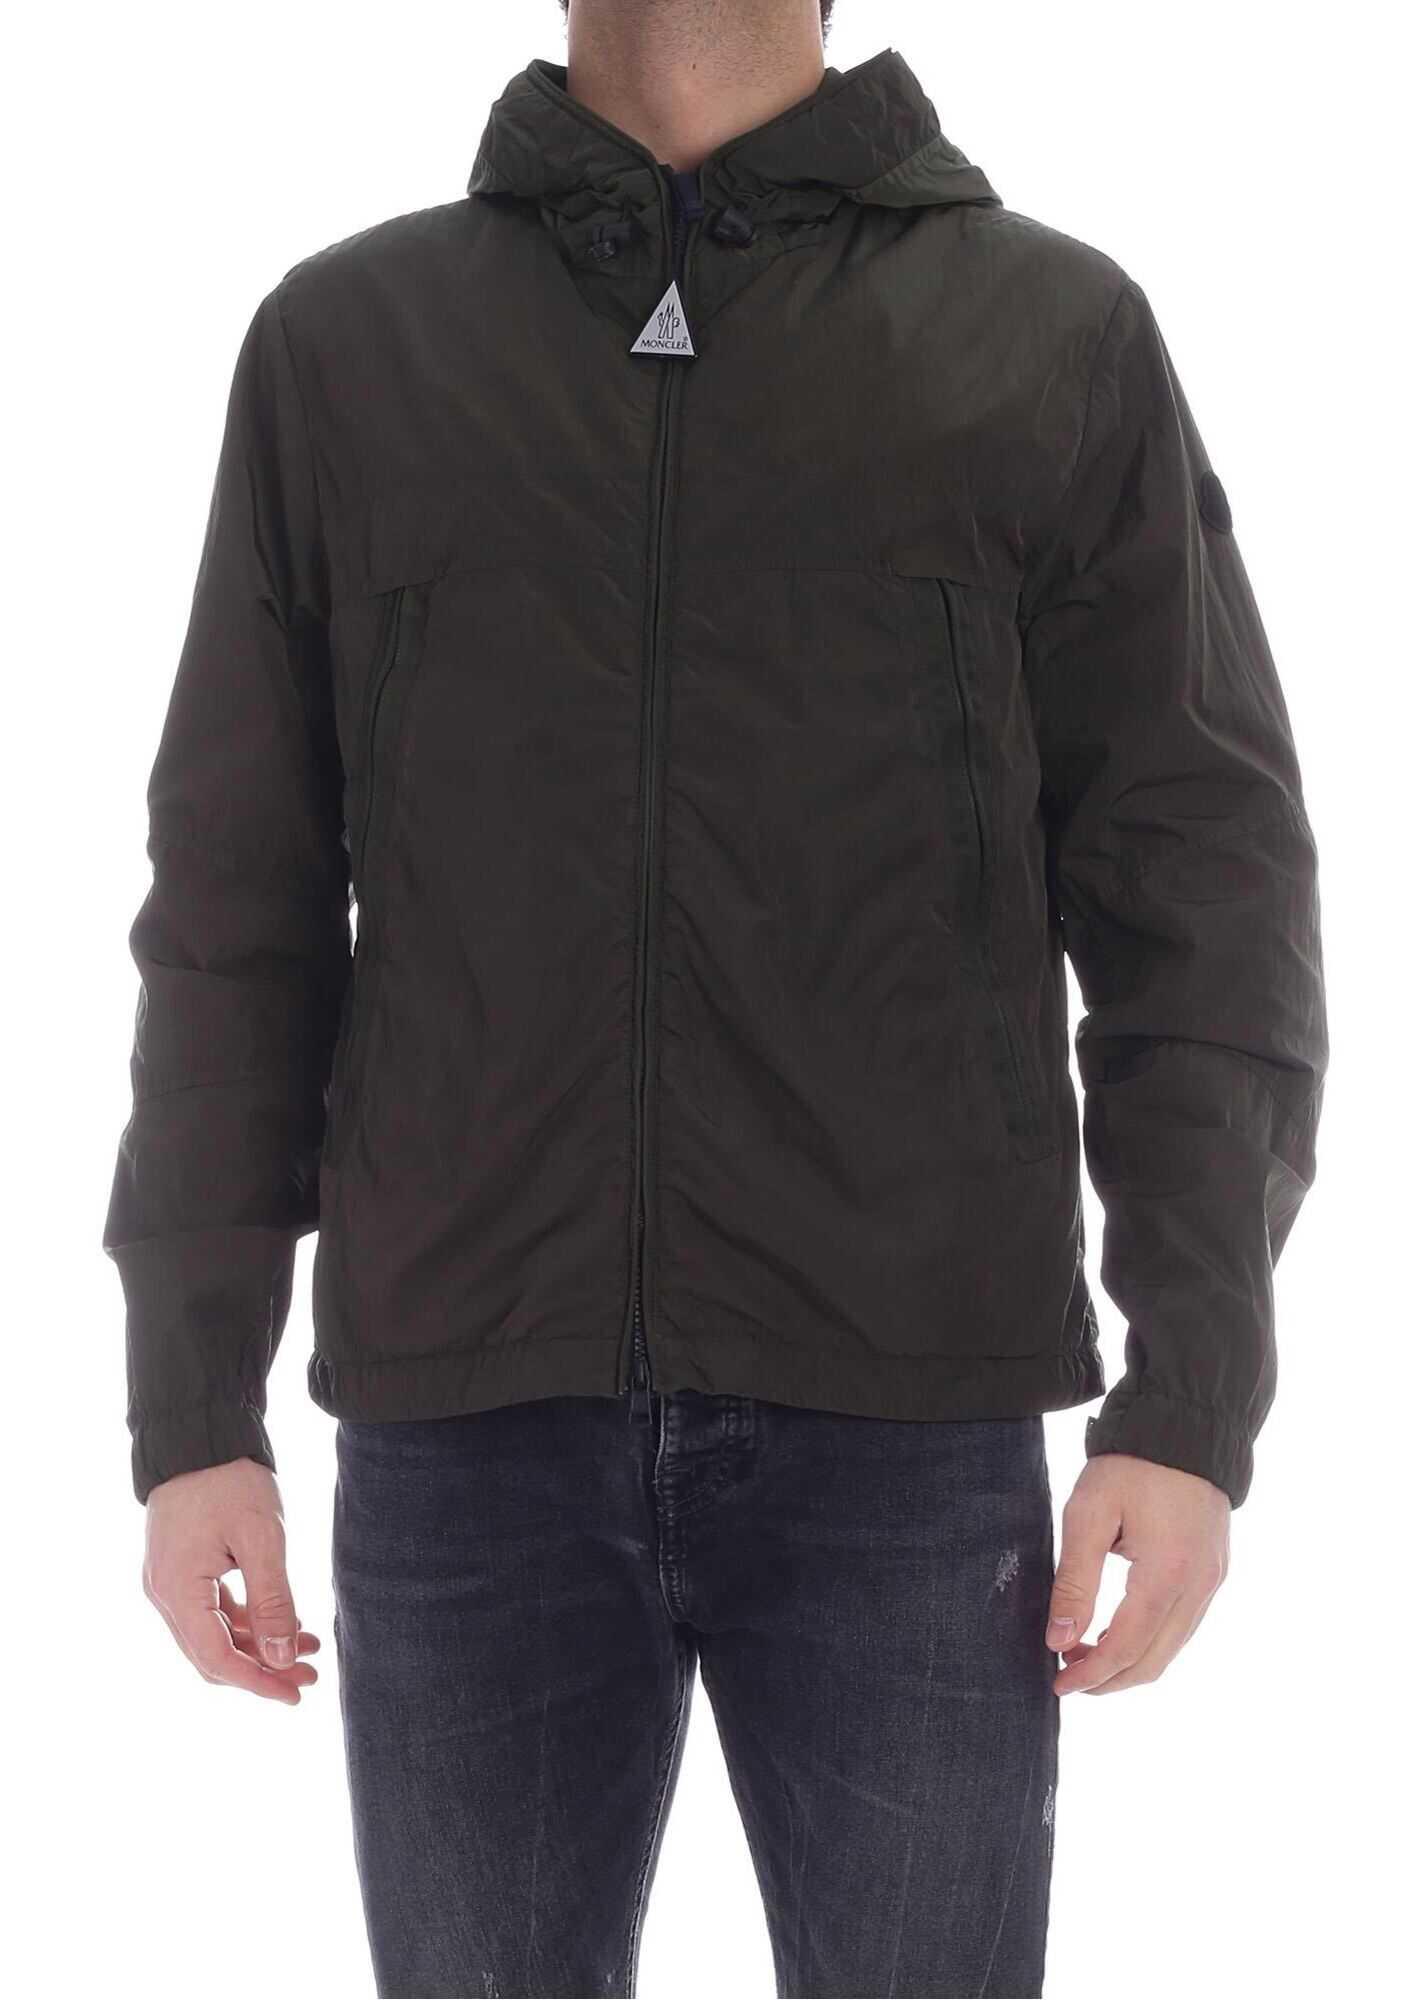 Moncler Scie Hooded Jacket In Dark Green Green imagine